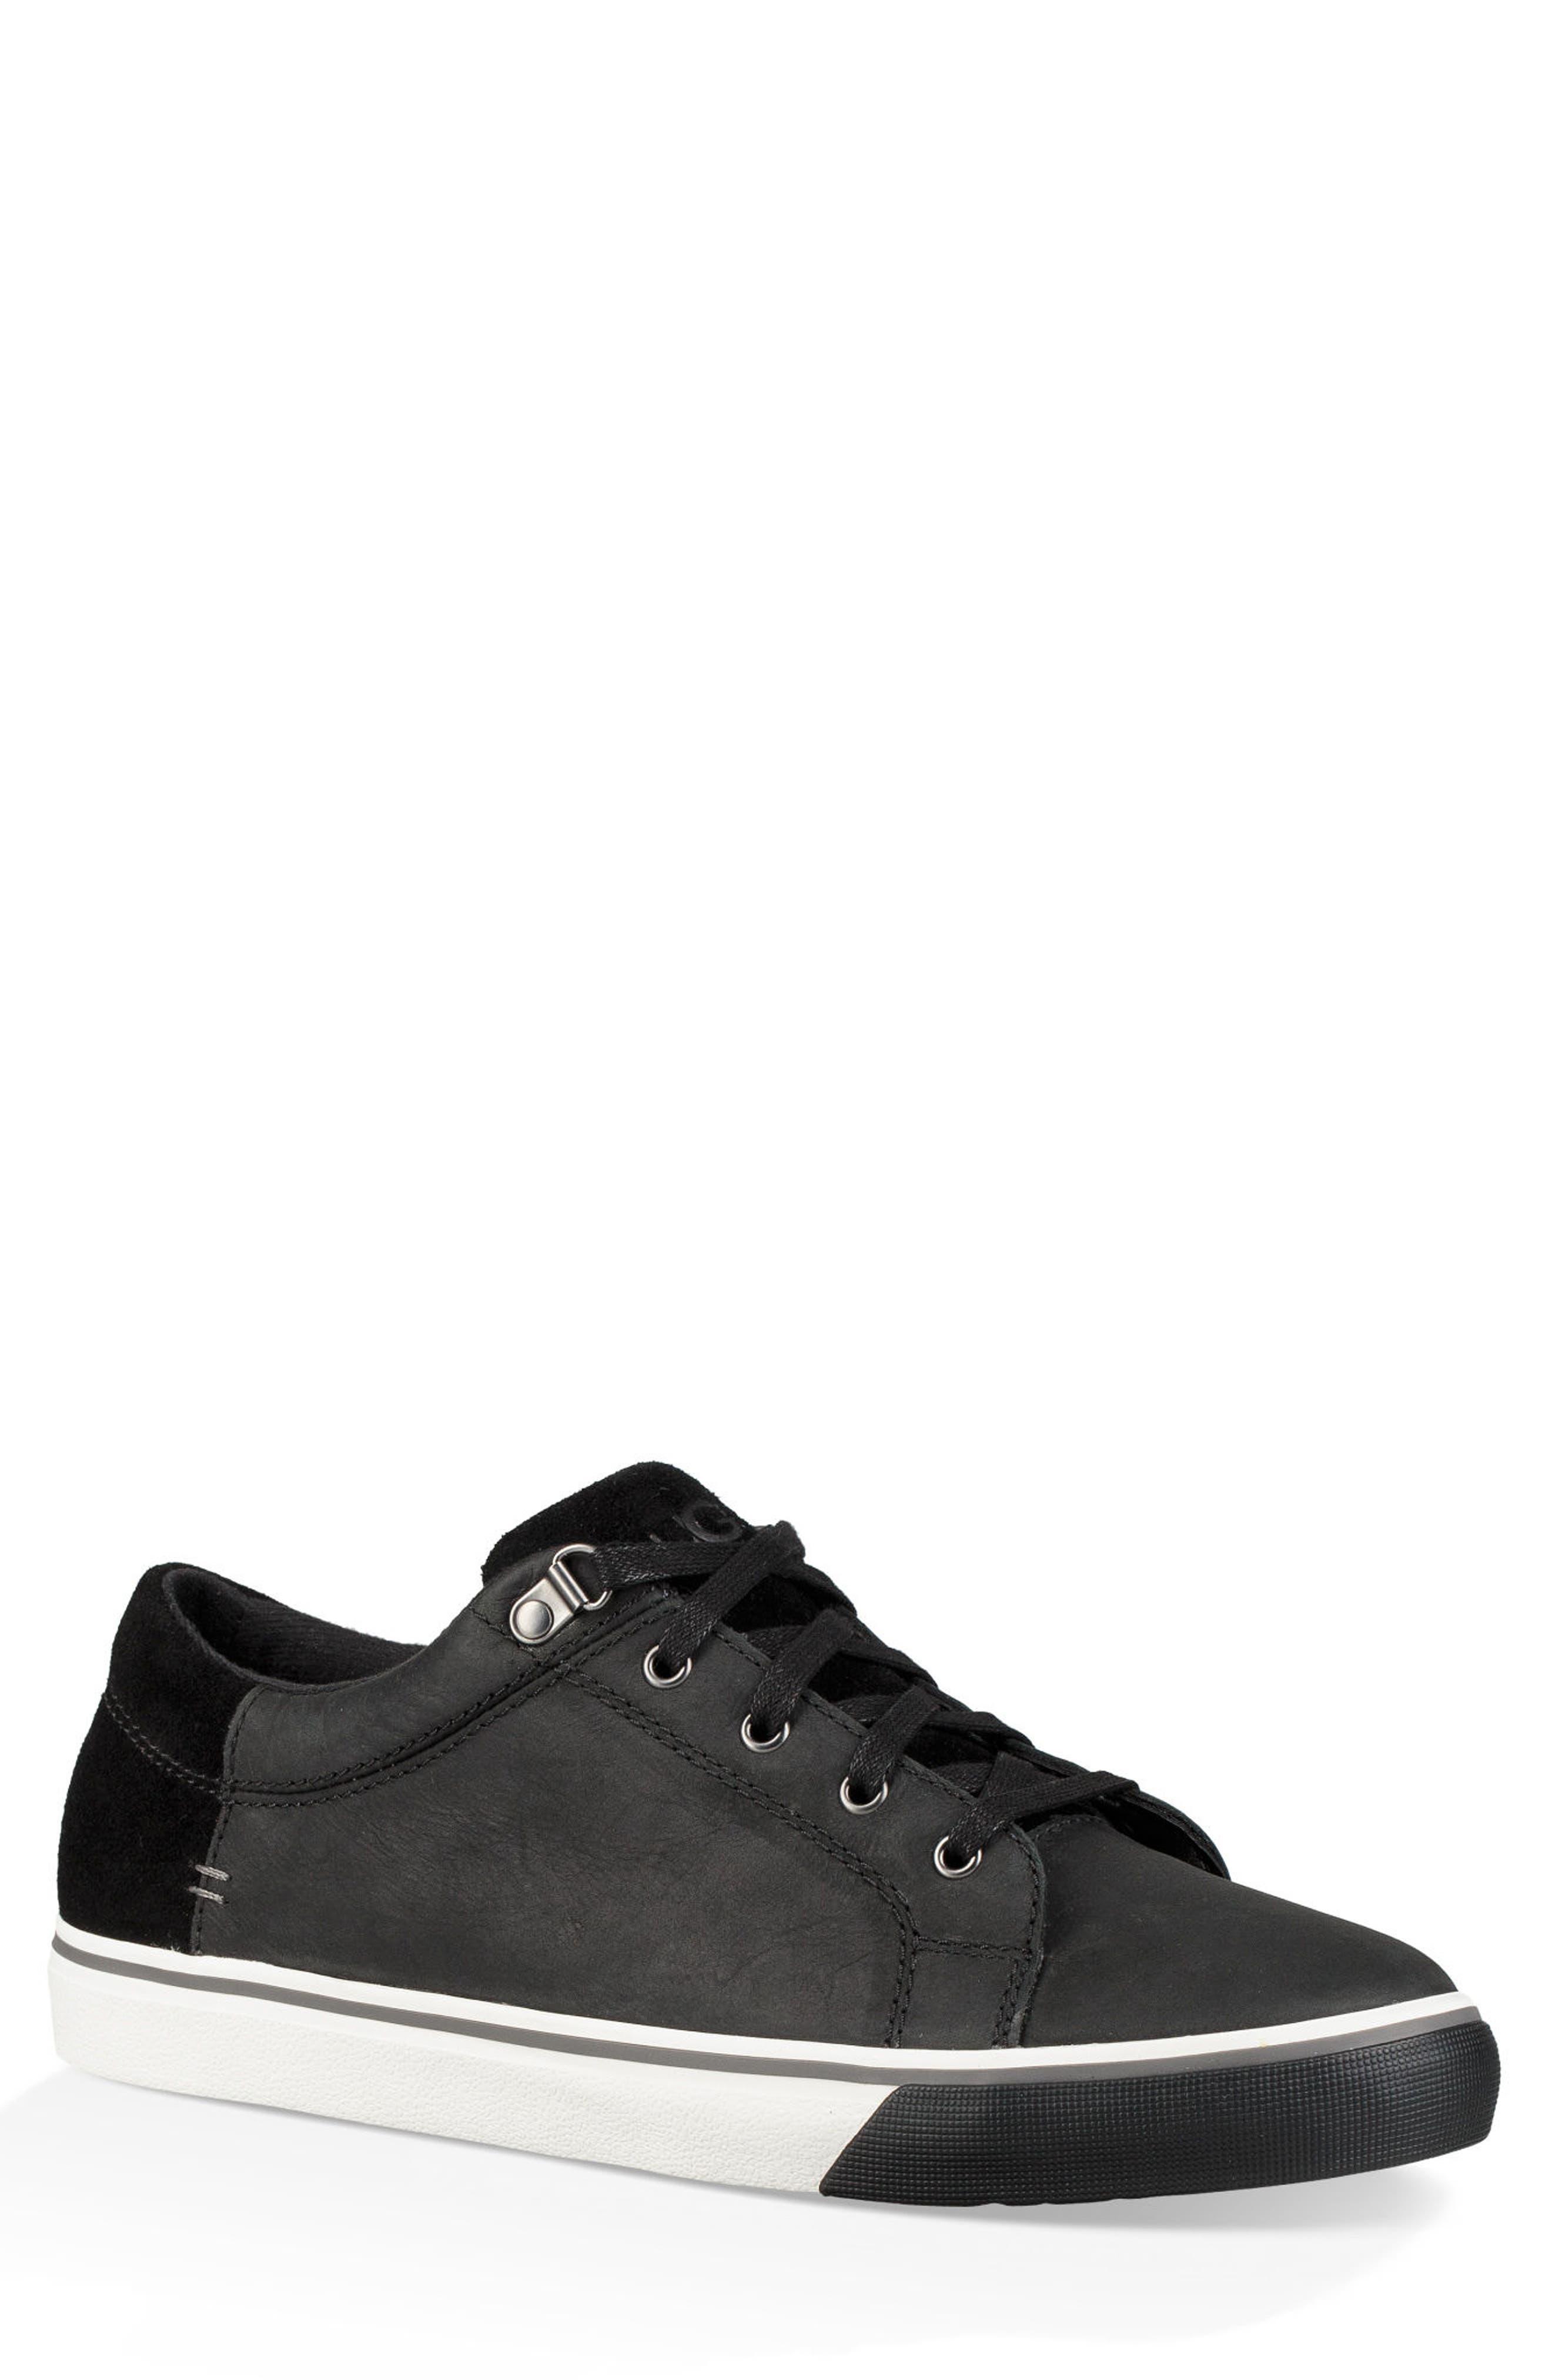 Brock II Waterproof Sneaker,                             Main thumbnail 1, color,                             BLACK